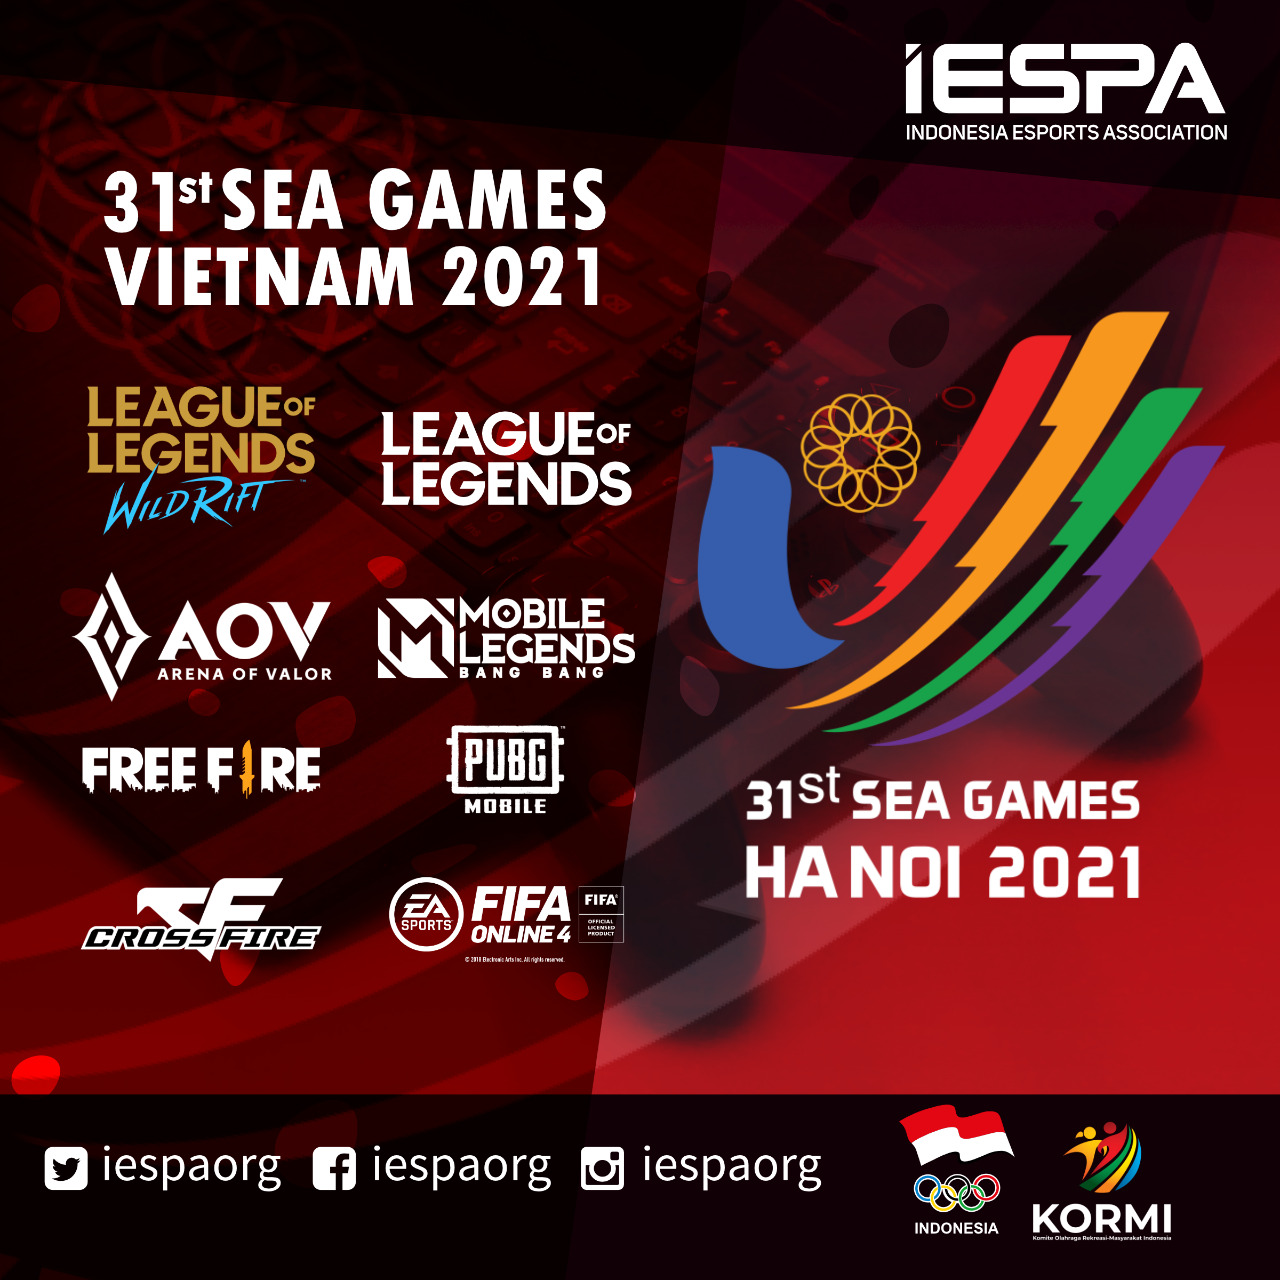 Perlombaan Esports Pada Ajang 31st SEA GAMES VIETNAM 2021